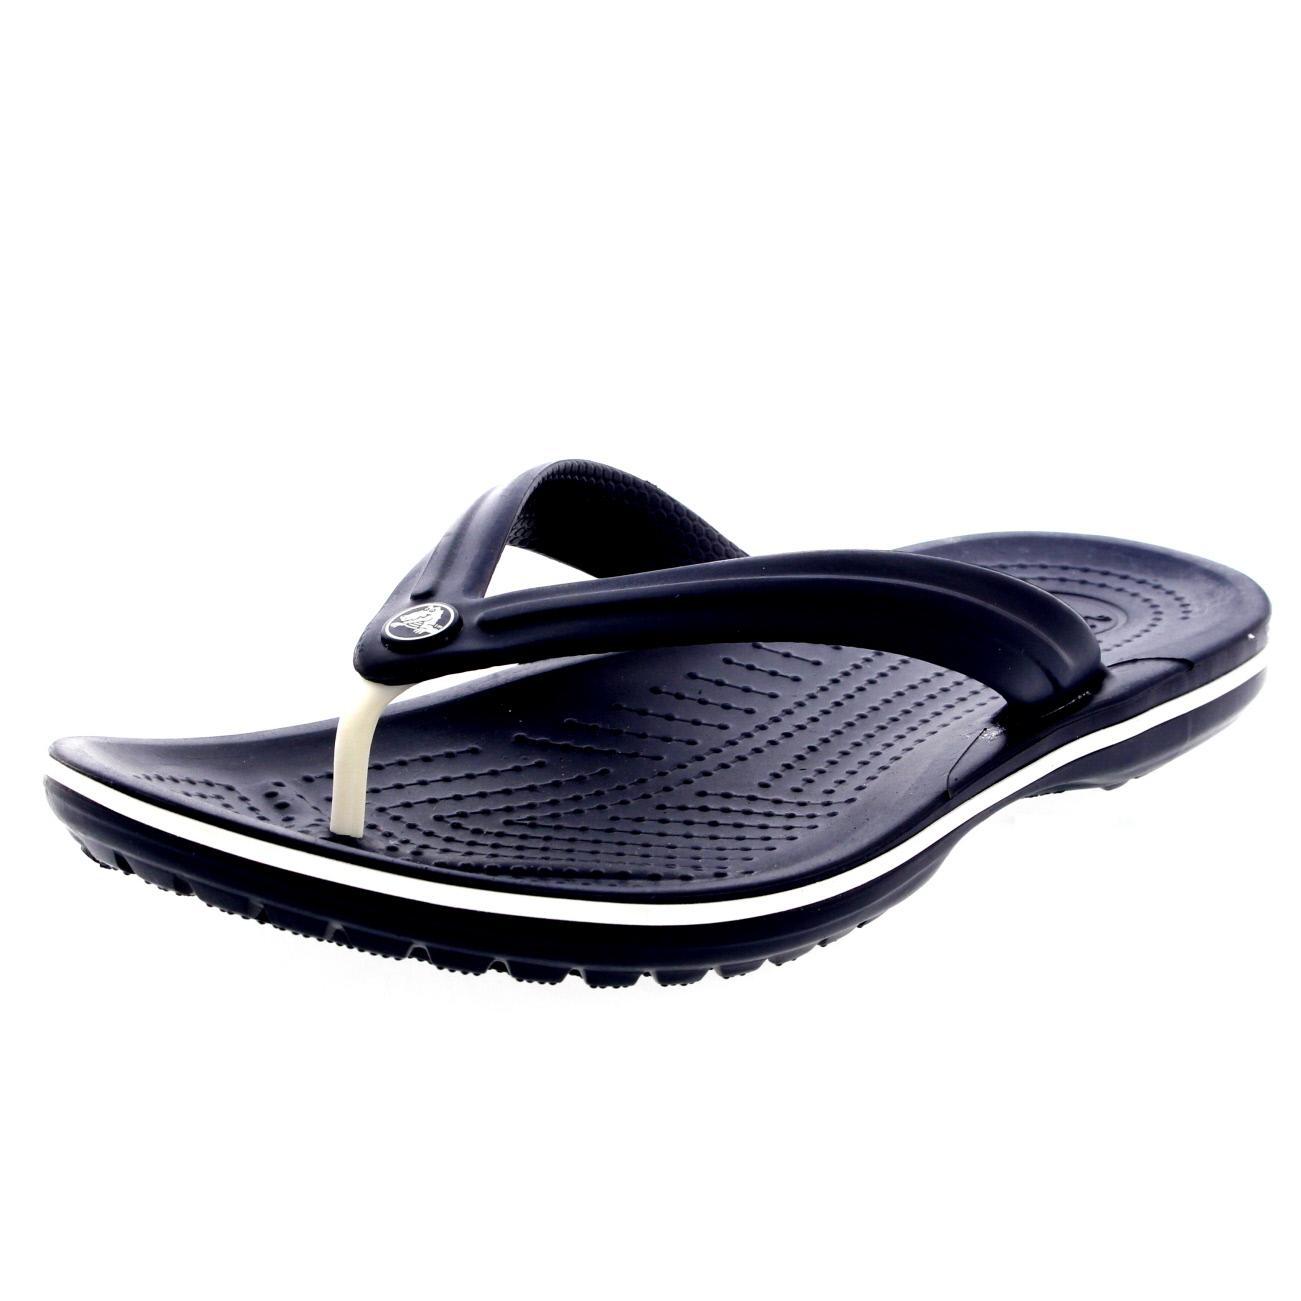 unisex mens womens crocs crocband flip slip on slipper beach flip flops uk 3 16 ebay. Black Bedroom Furniture Sets. Home Design Ideas